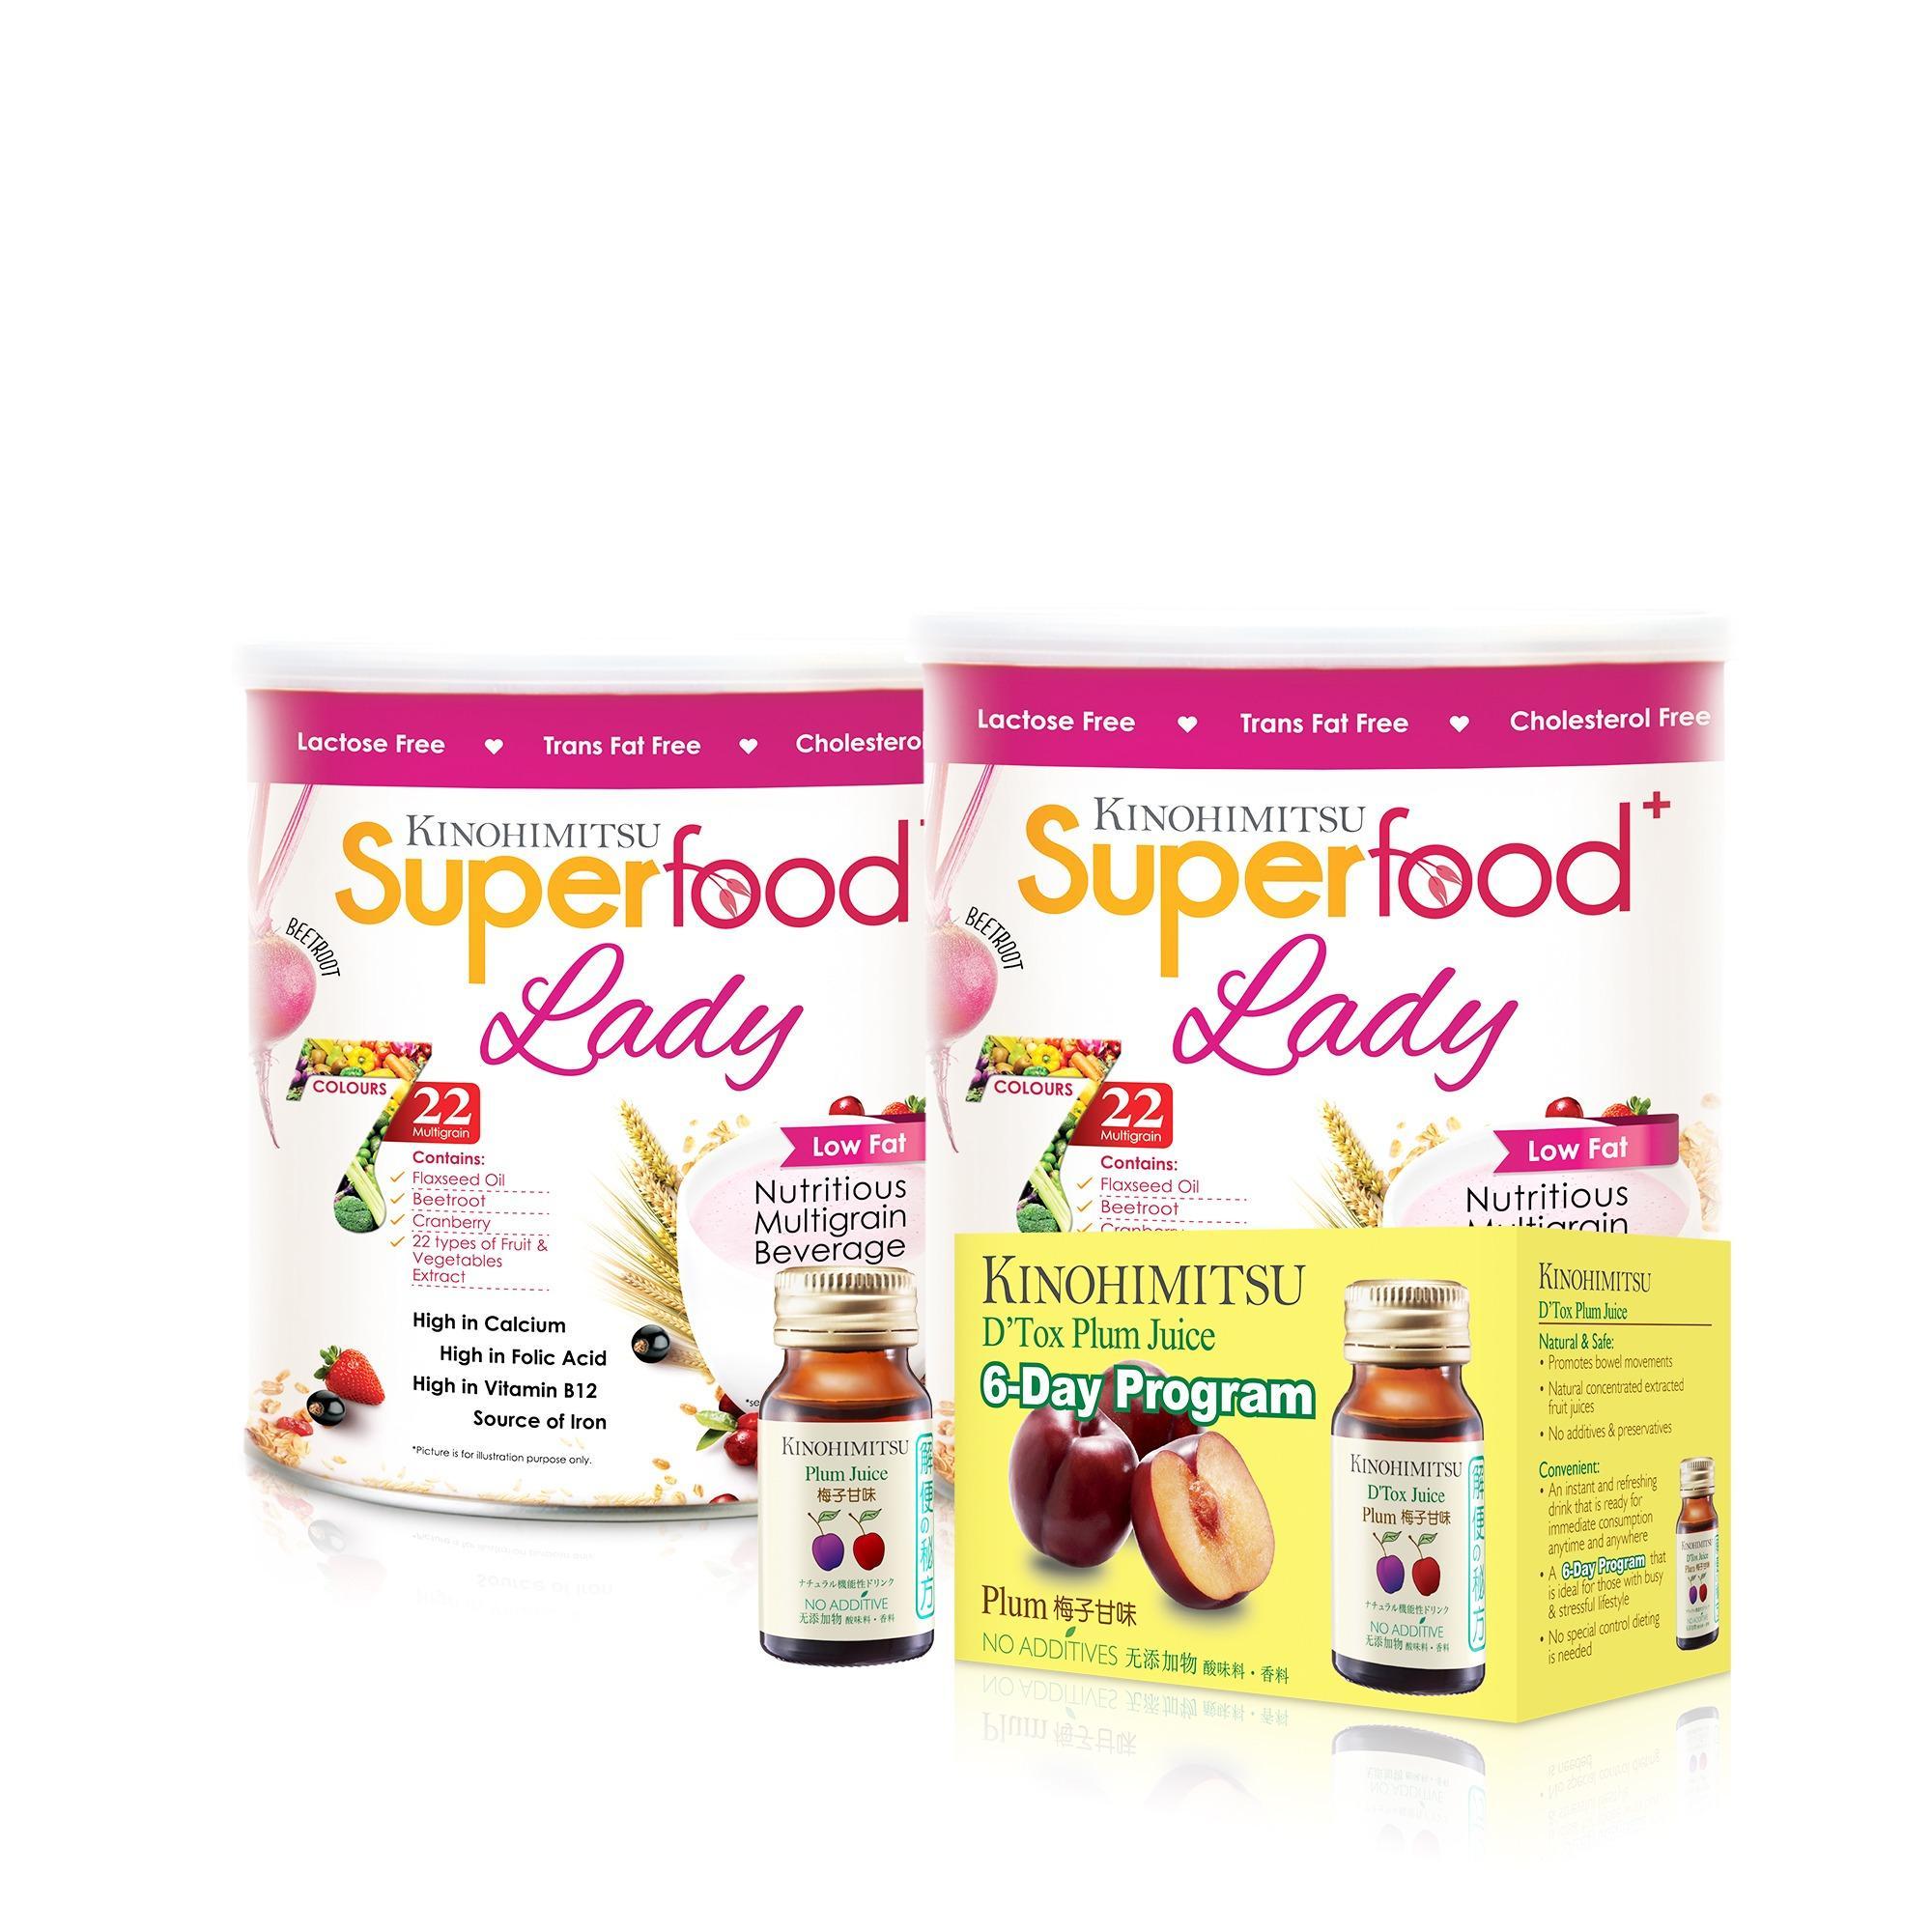 Kinohimitsu Superfood Lady 500G X 2 Plum Juice 6 S Cheap